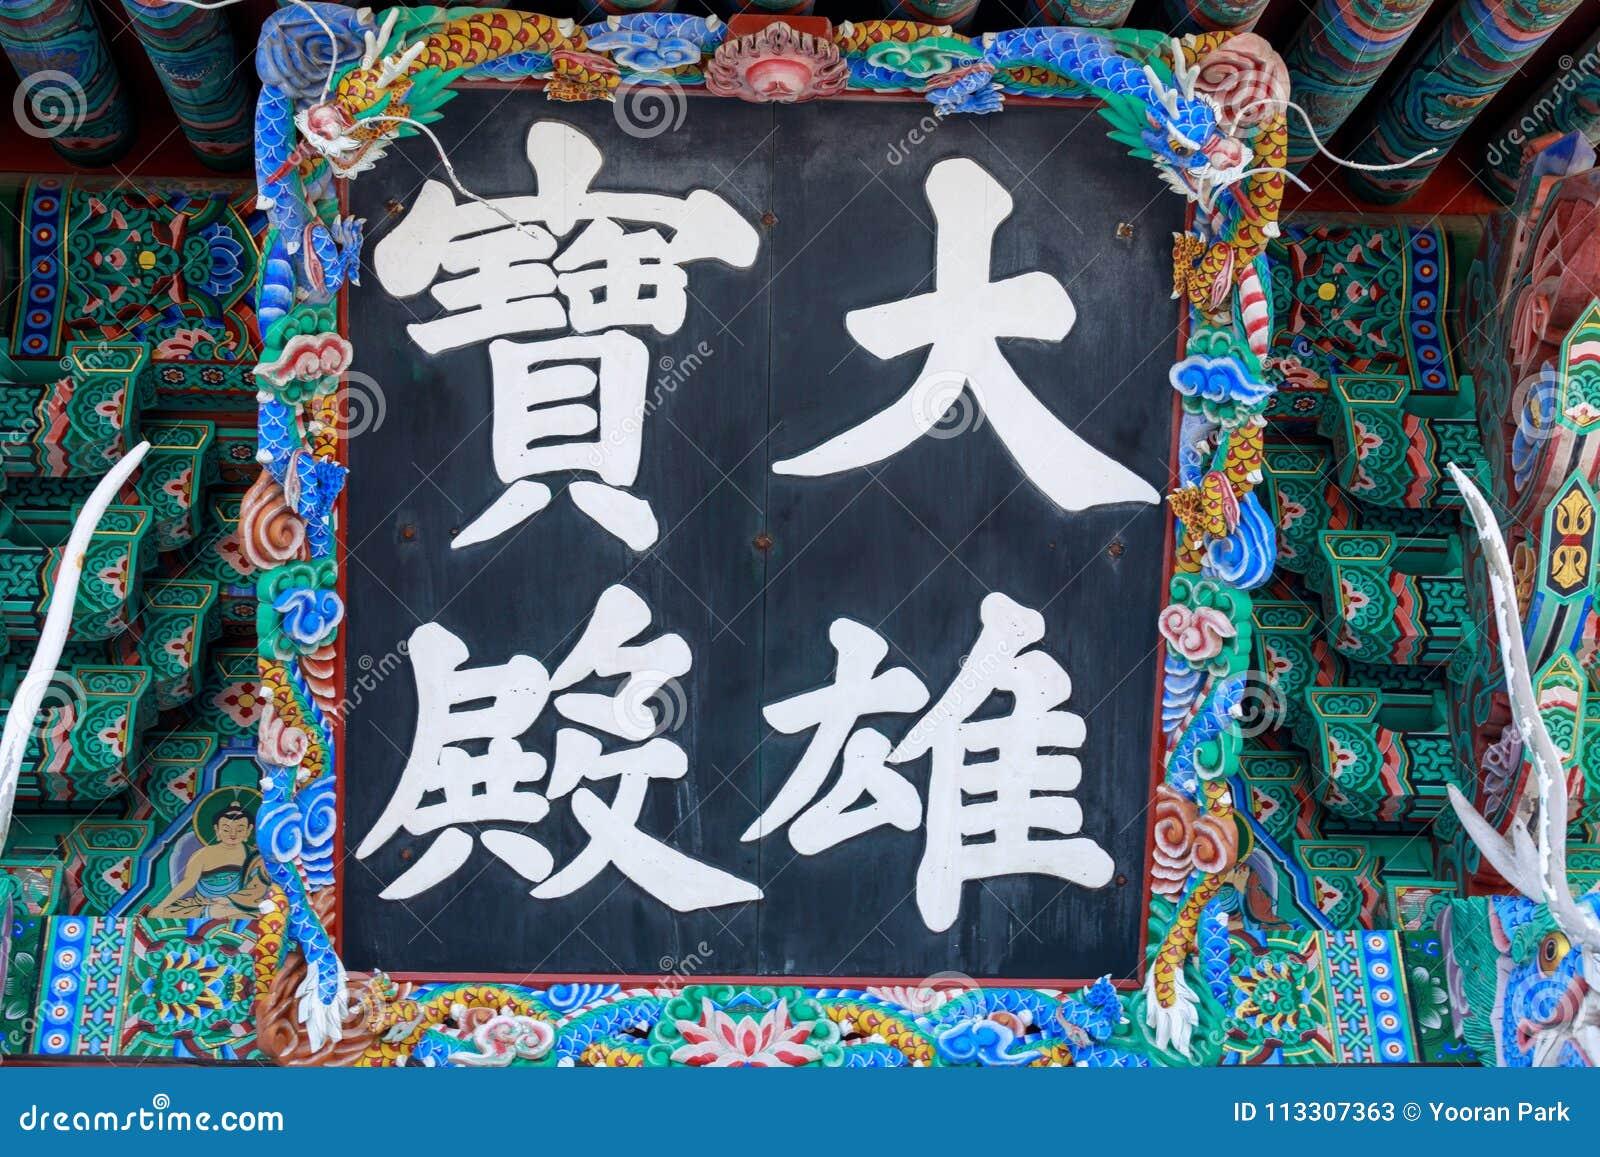 Chinese characters in Haedong Yonggungsa Temple, Busan